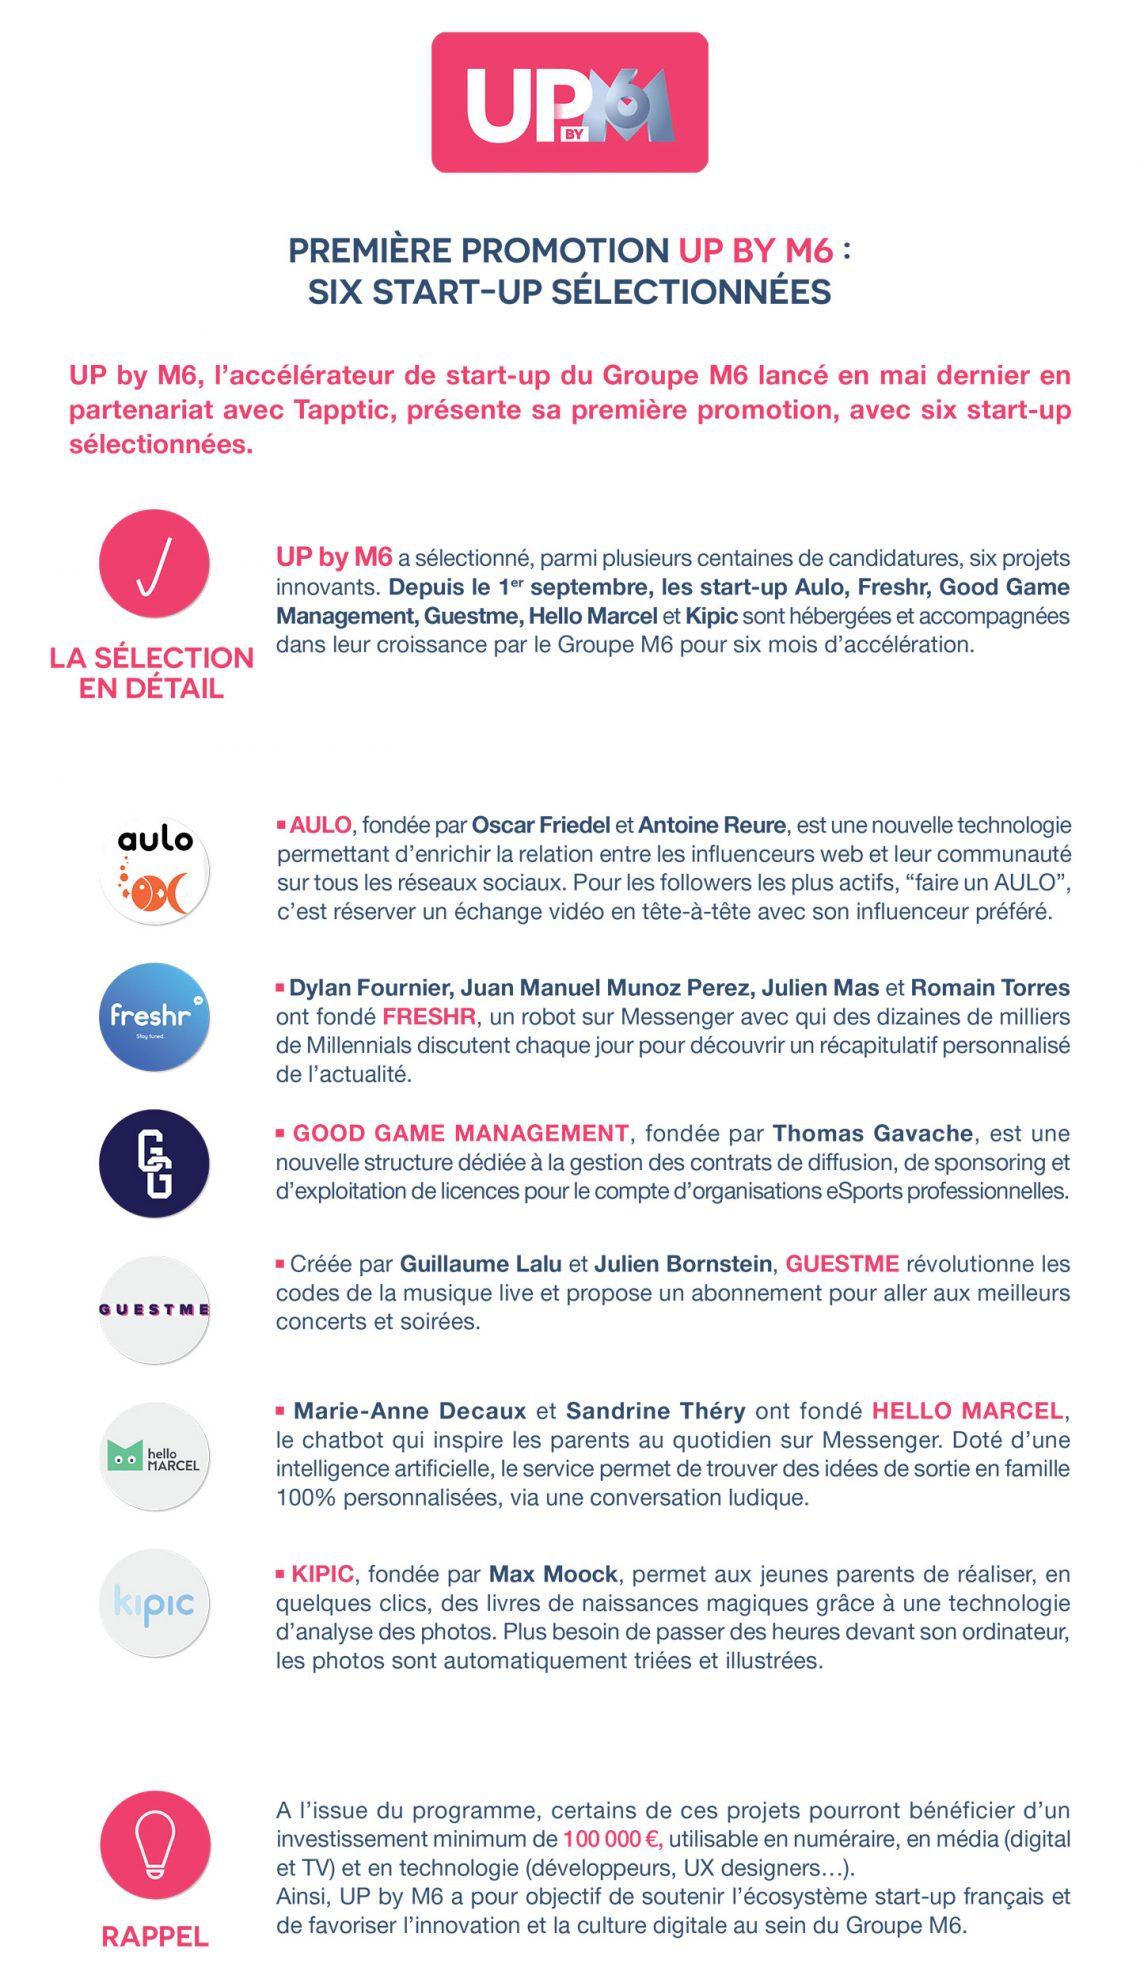 Première promotion UP BY M6, six start-up sélectionnées